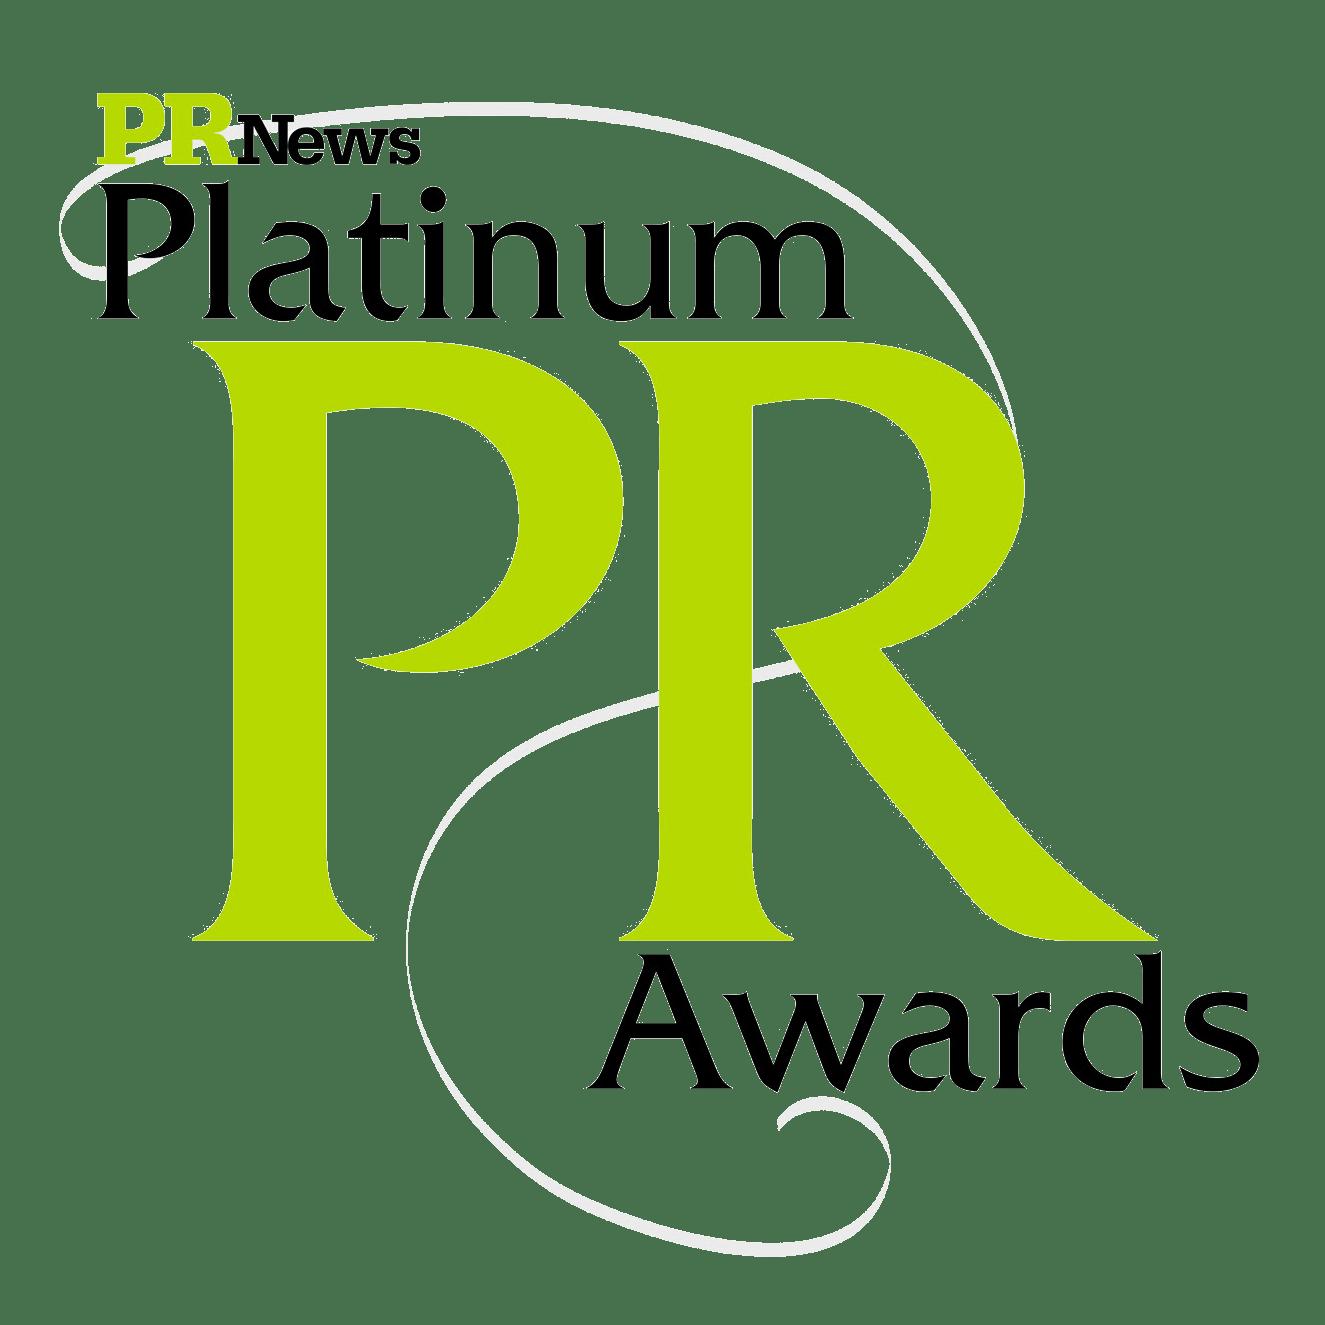 (PR News) Platinum PR Awards